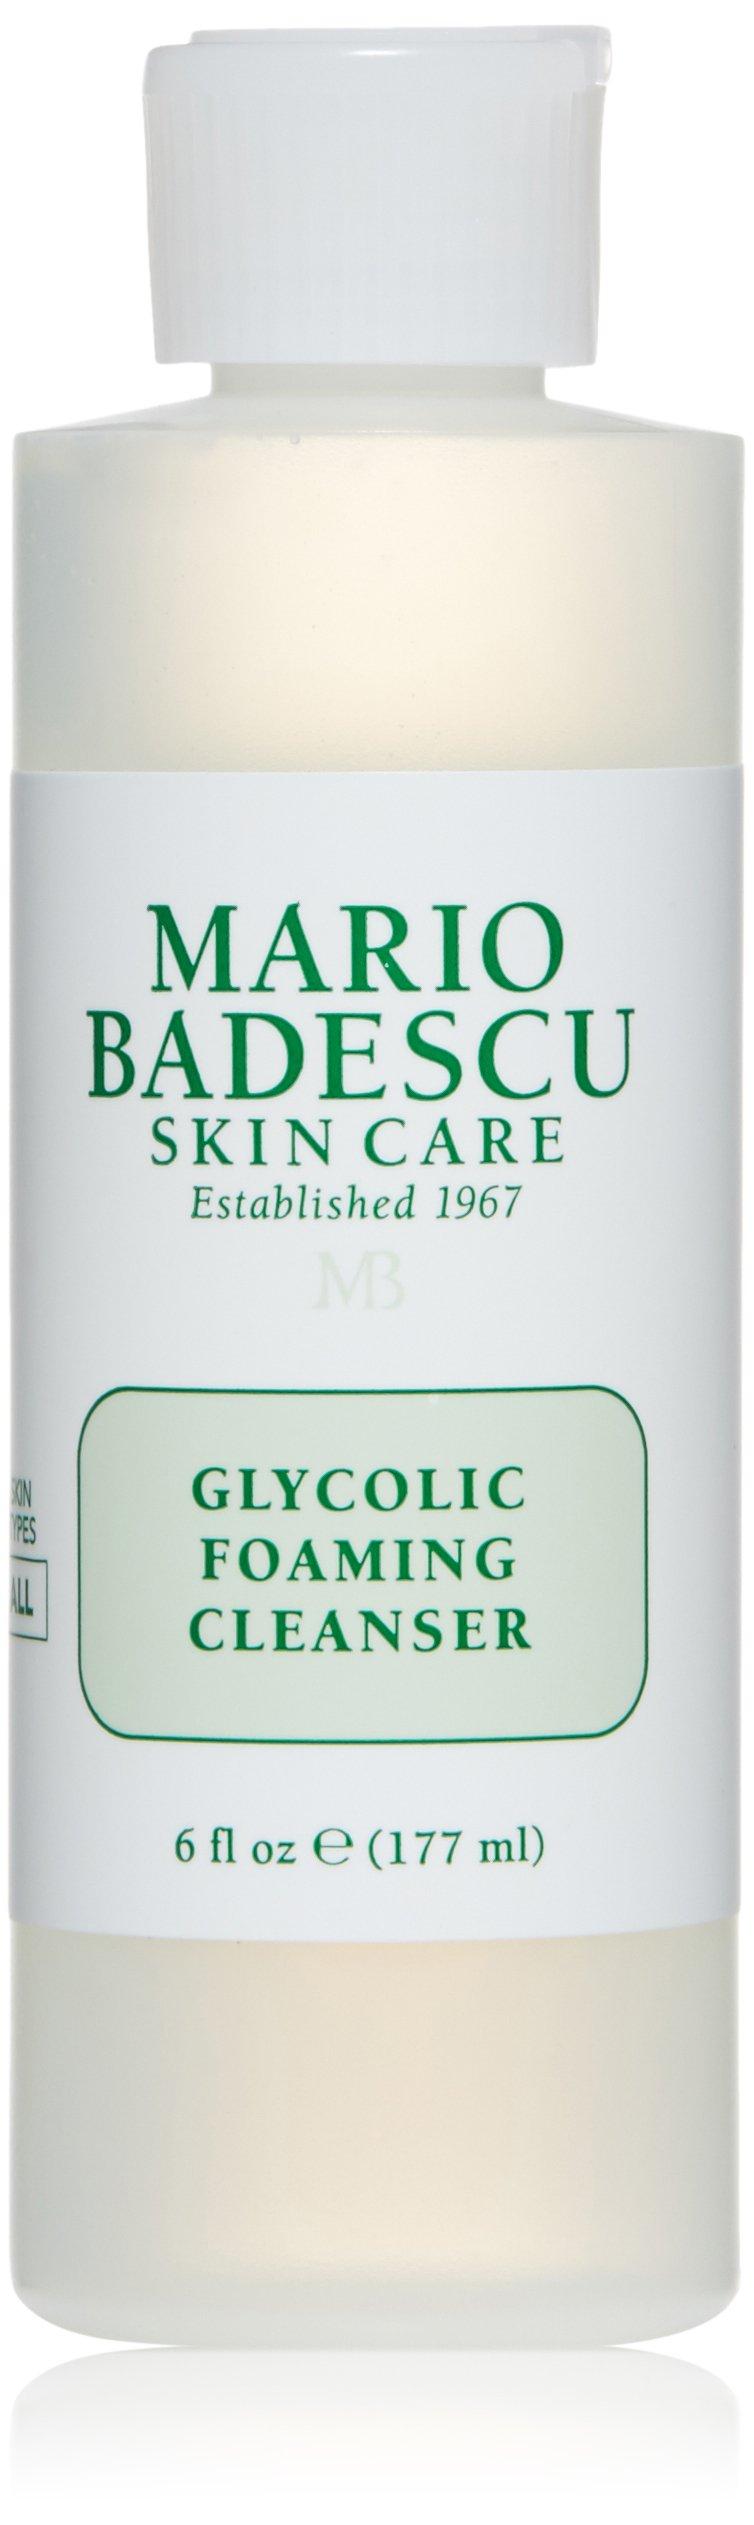 Mario Badescu Glycolic Foaming Cleanser, 6 Fl Oz by Mario Badescu